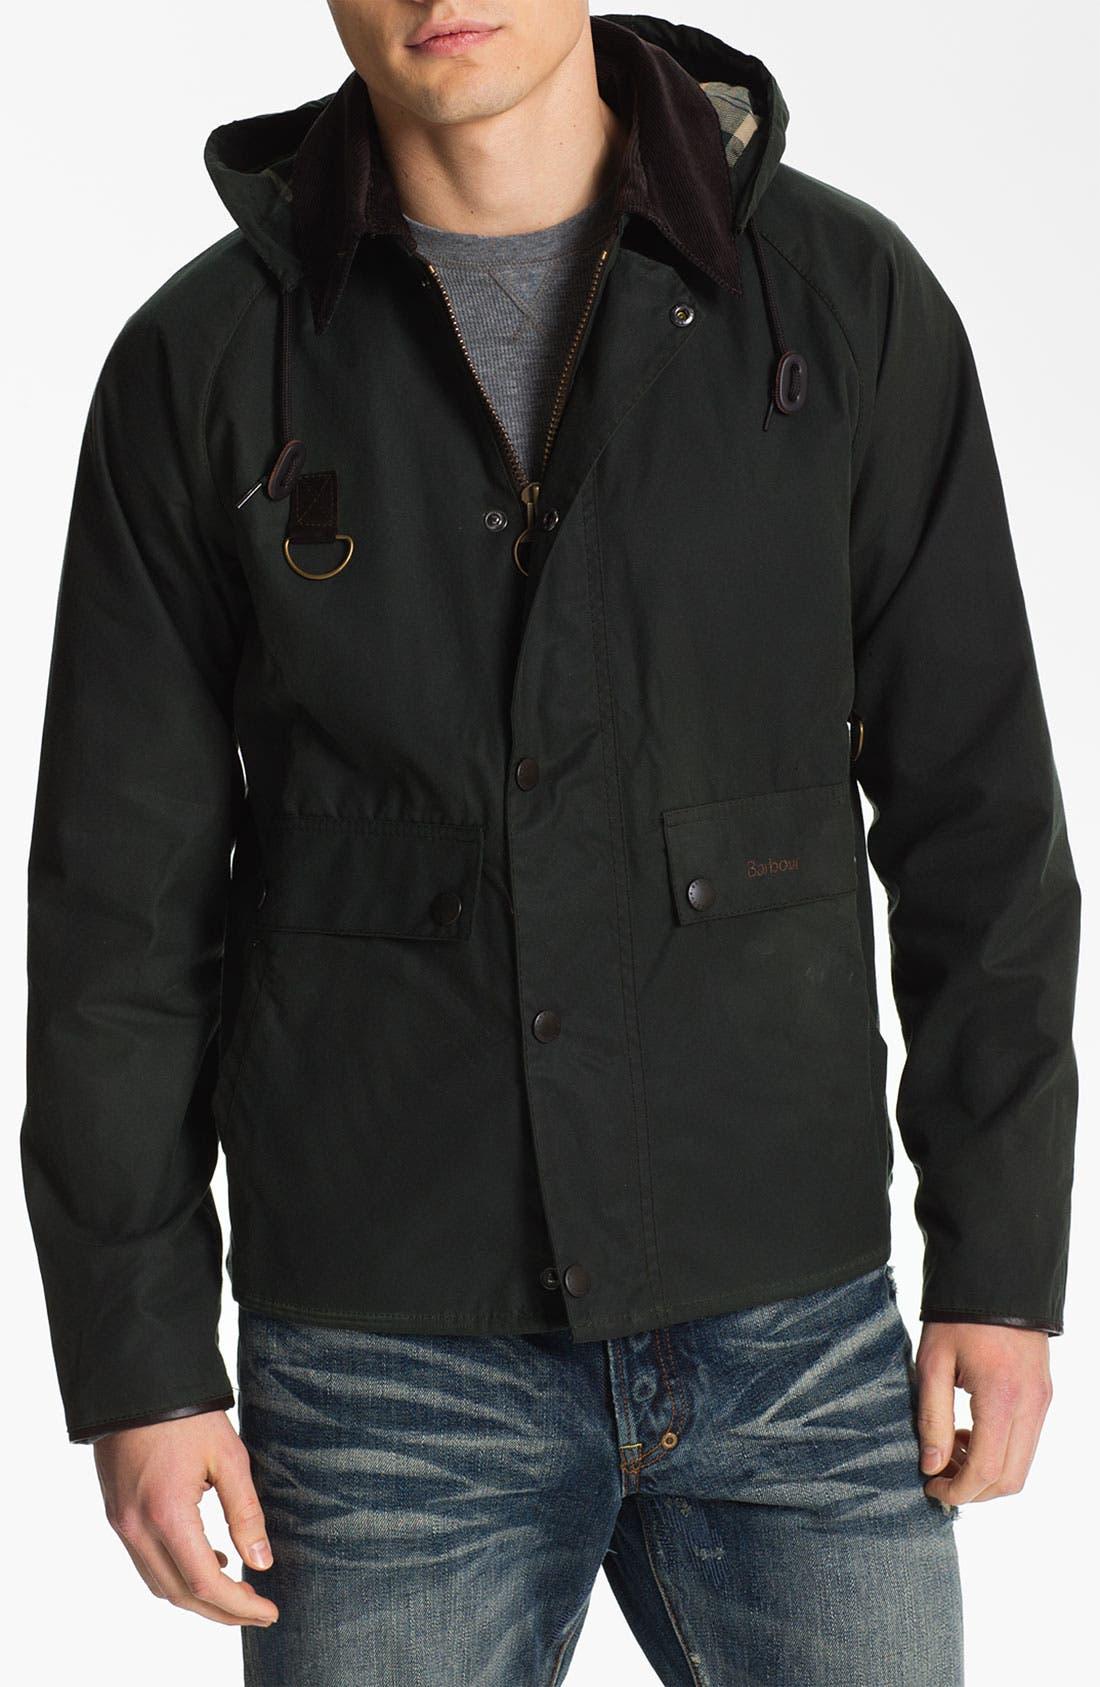 Alternate Image 1 Selected - Barbour 'Standen' Hooded Jacket